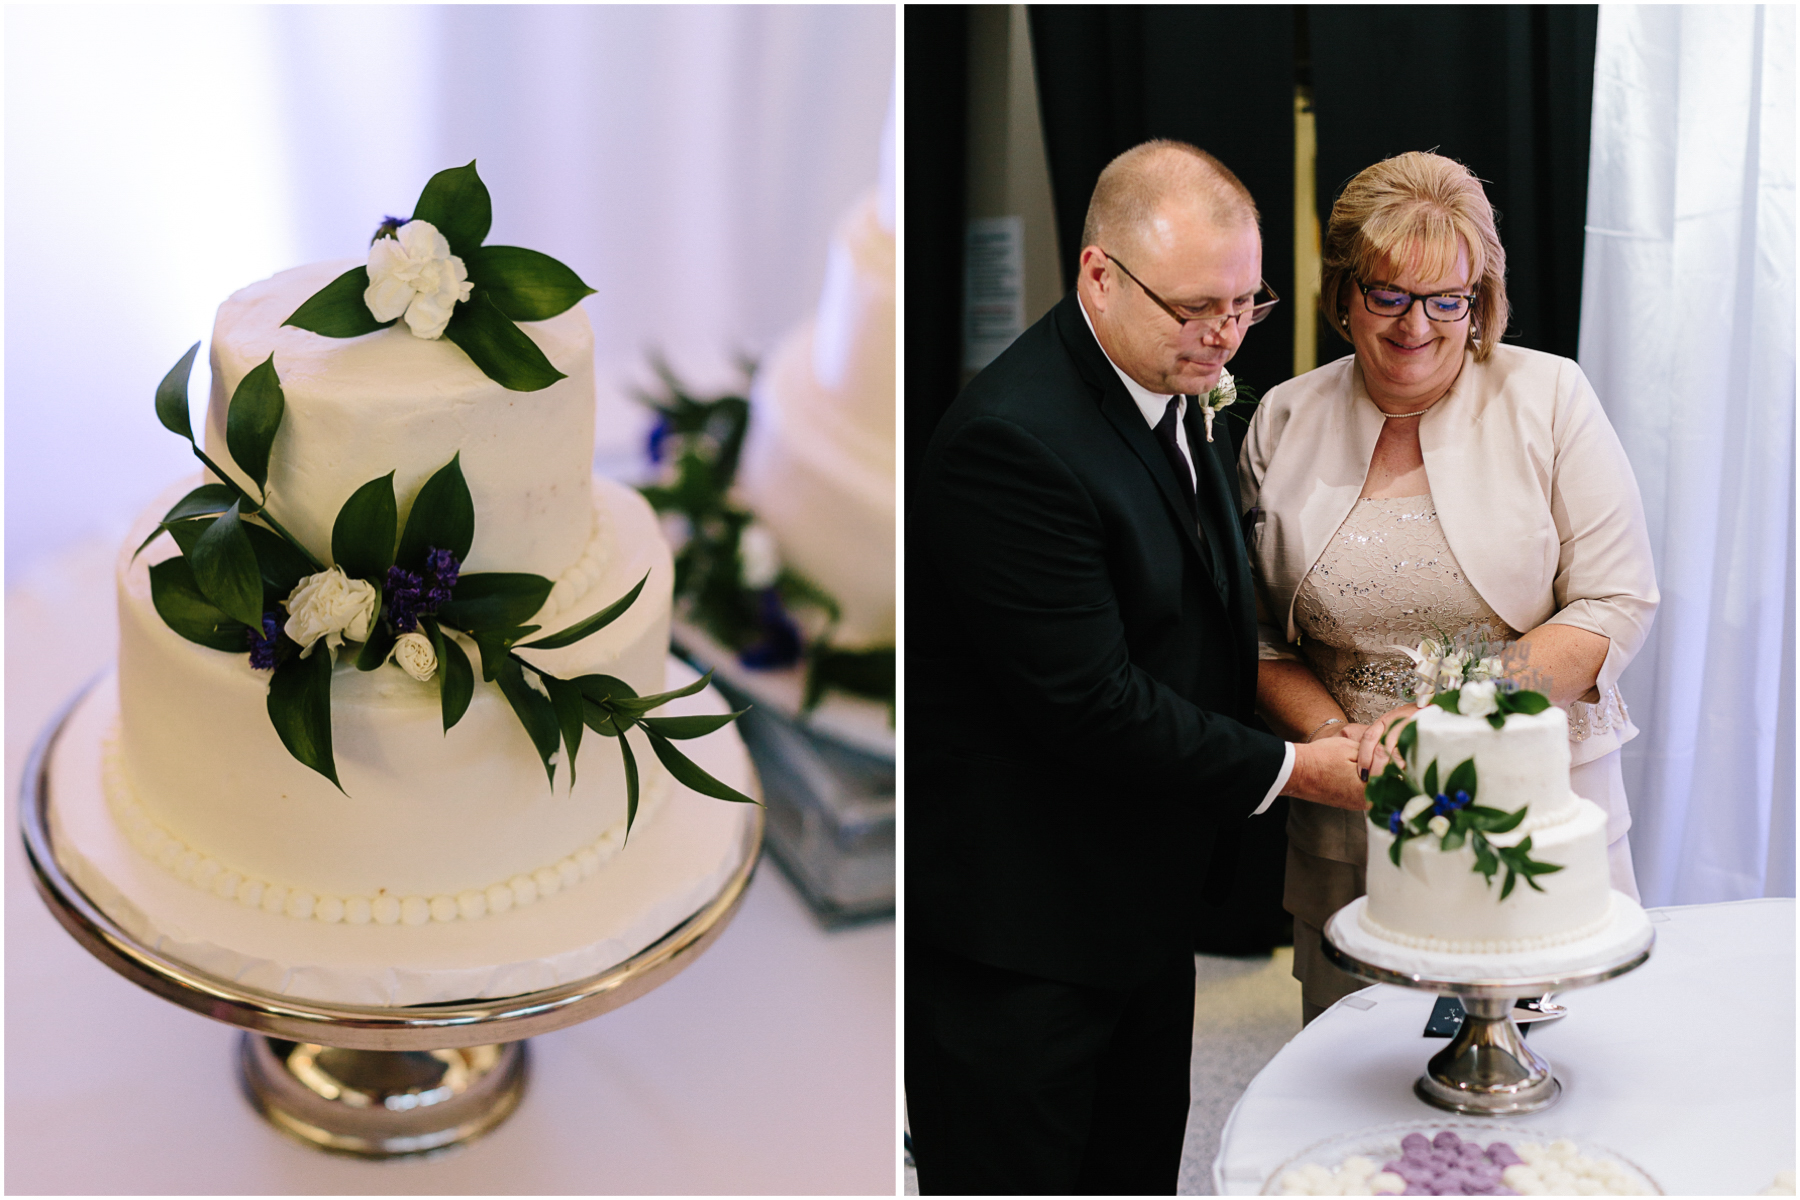 alyssa barletter photography kansas city wedding photographer katie and kendall-64.jpg